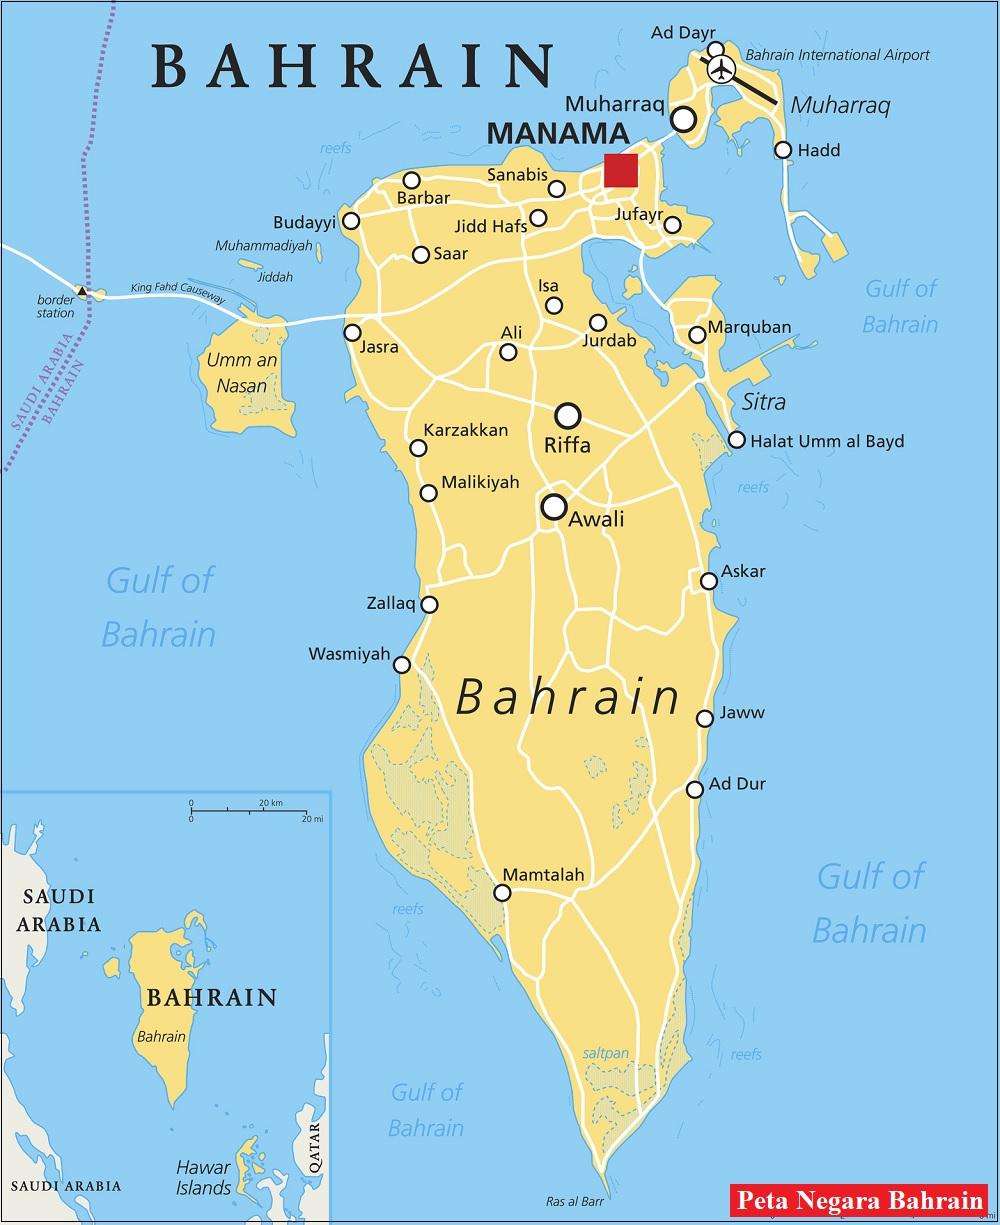 Peta Negara Bahrain